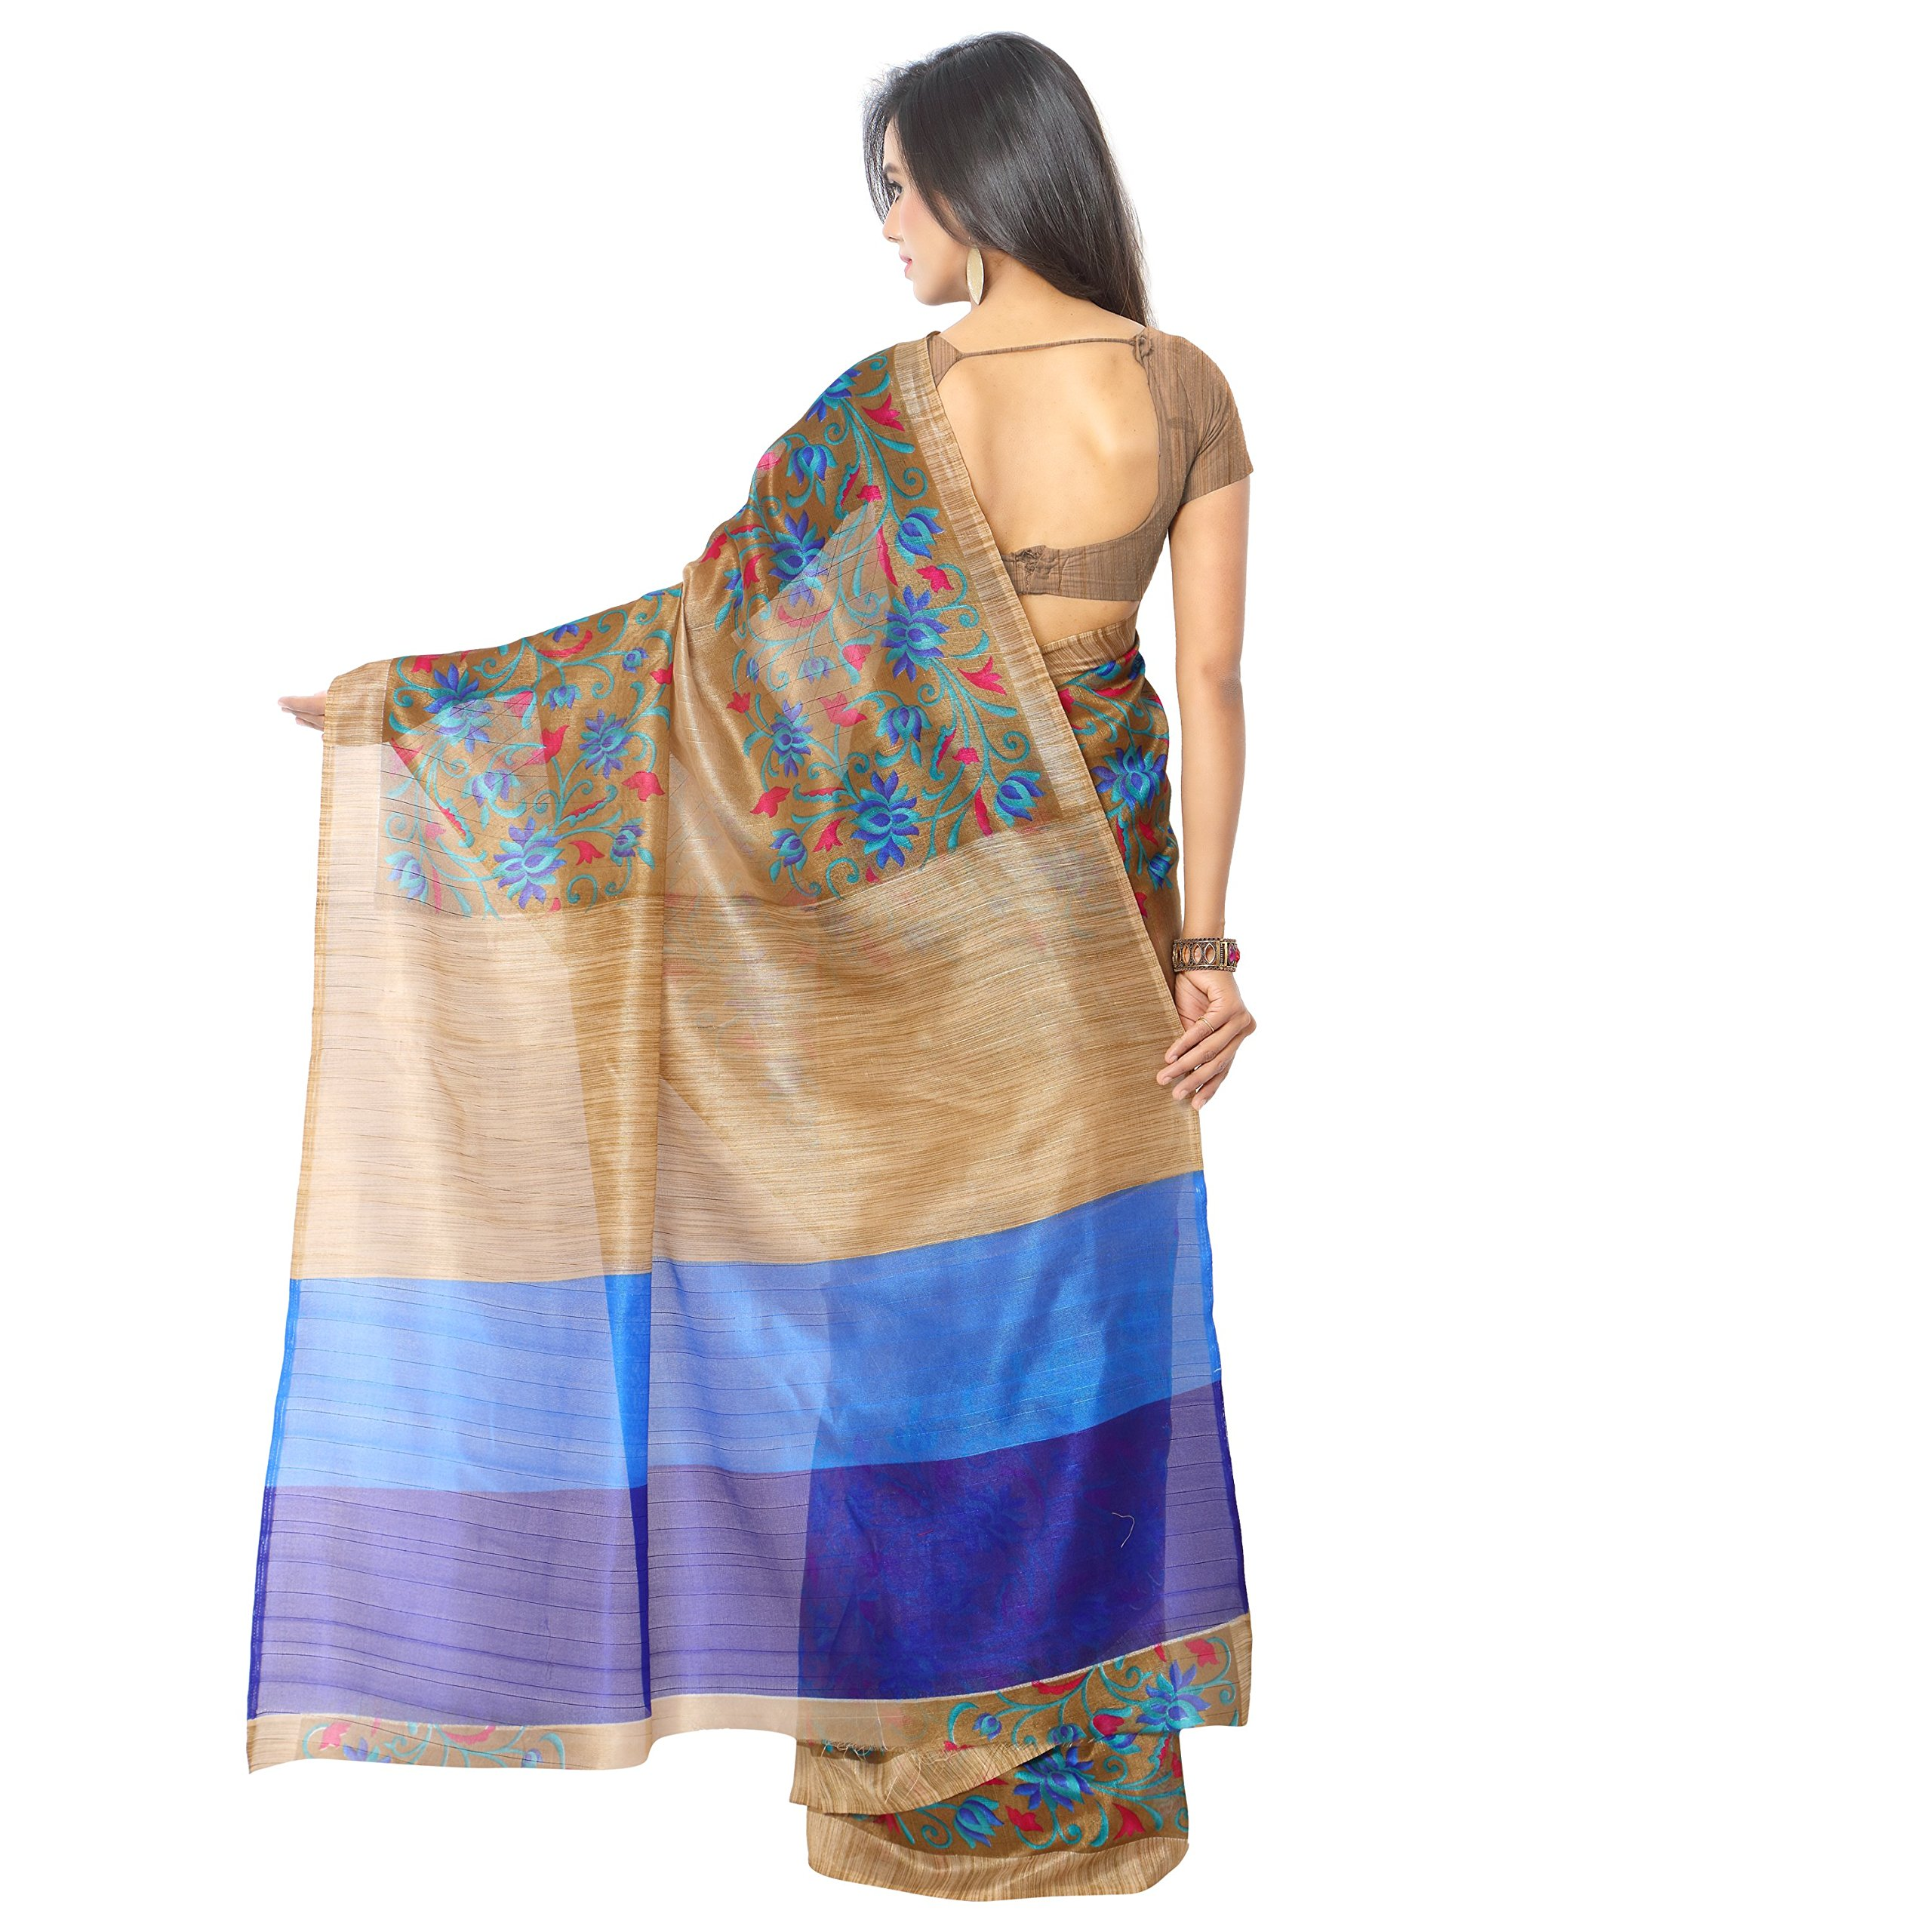 Jaanvi fashion Women's Raw Silk Saree Free Size Blue by Jaanvi fashion (Image #2)